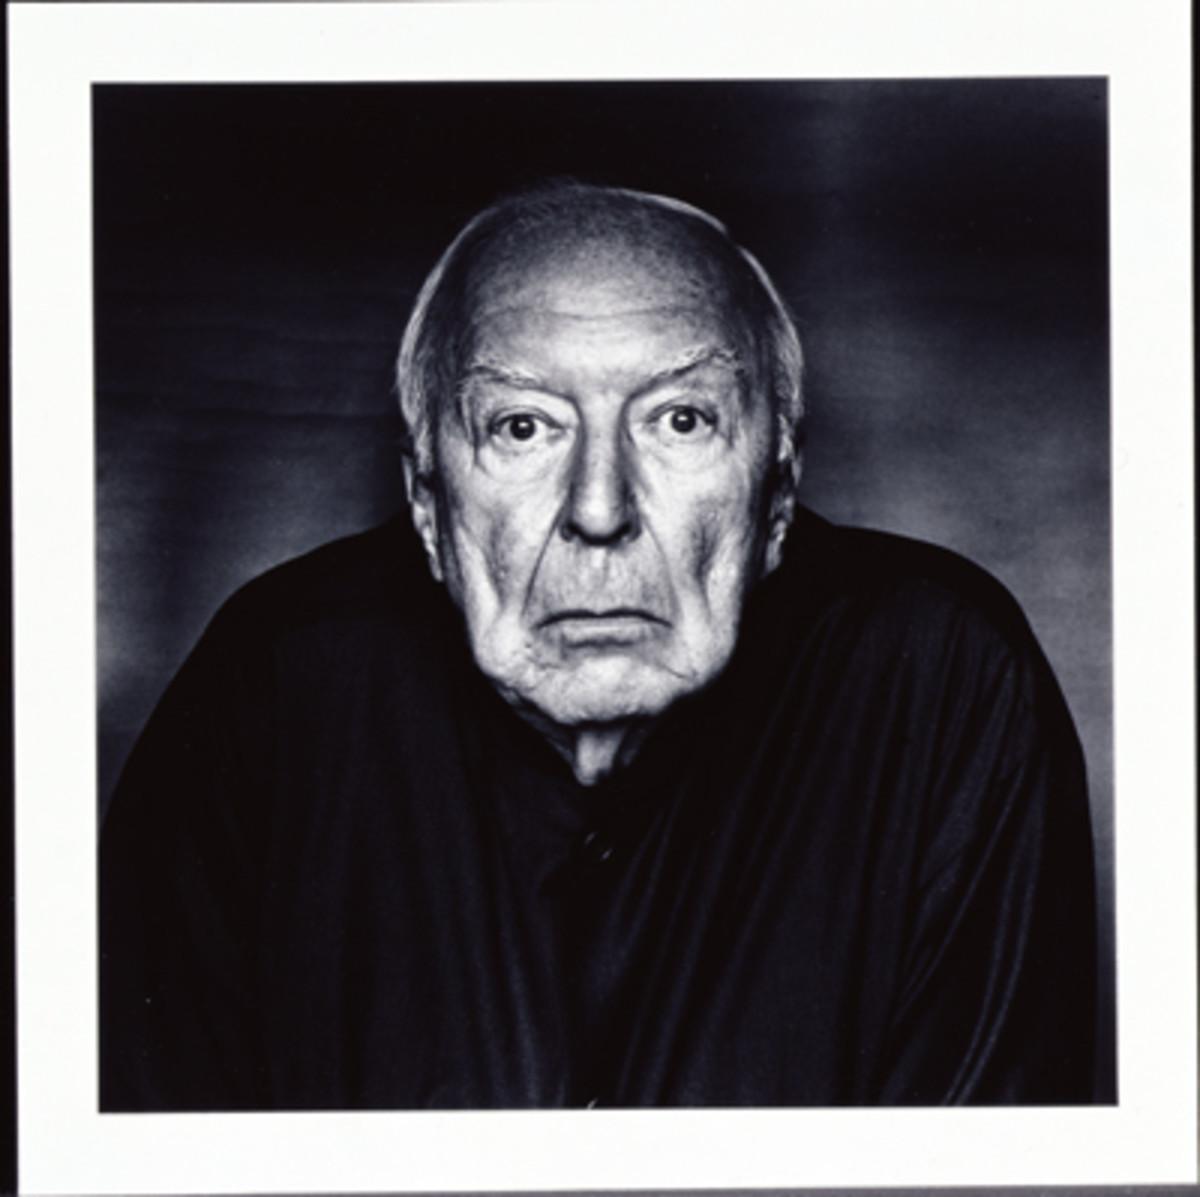 Jasper Johns, N.Y. 2006